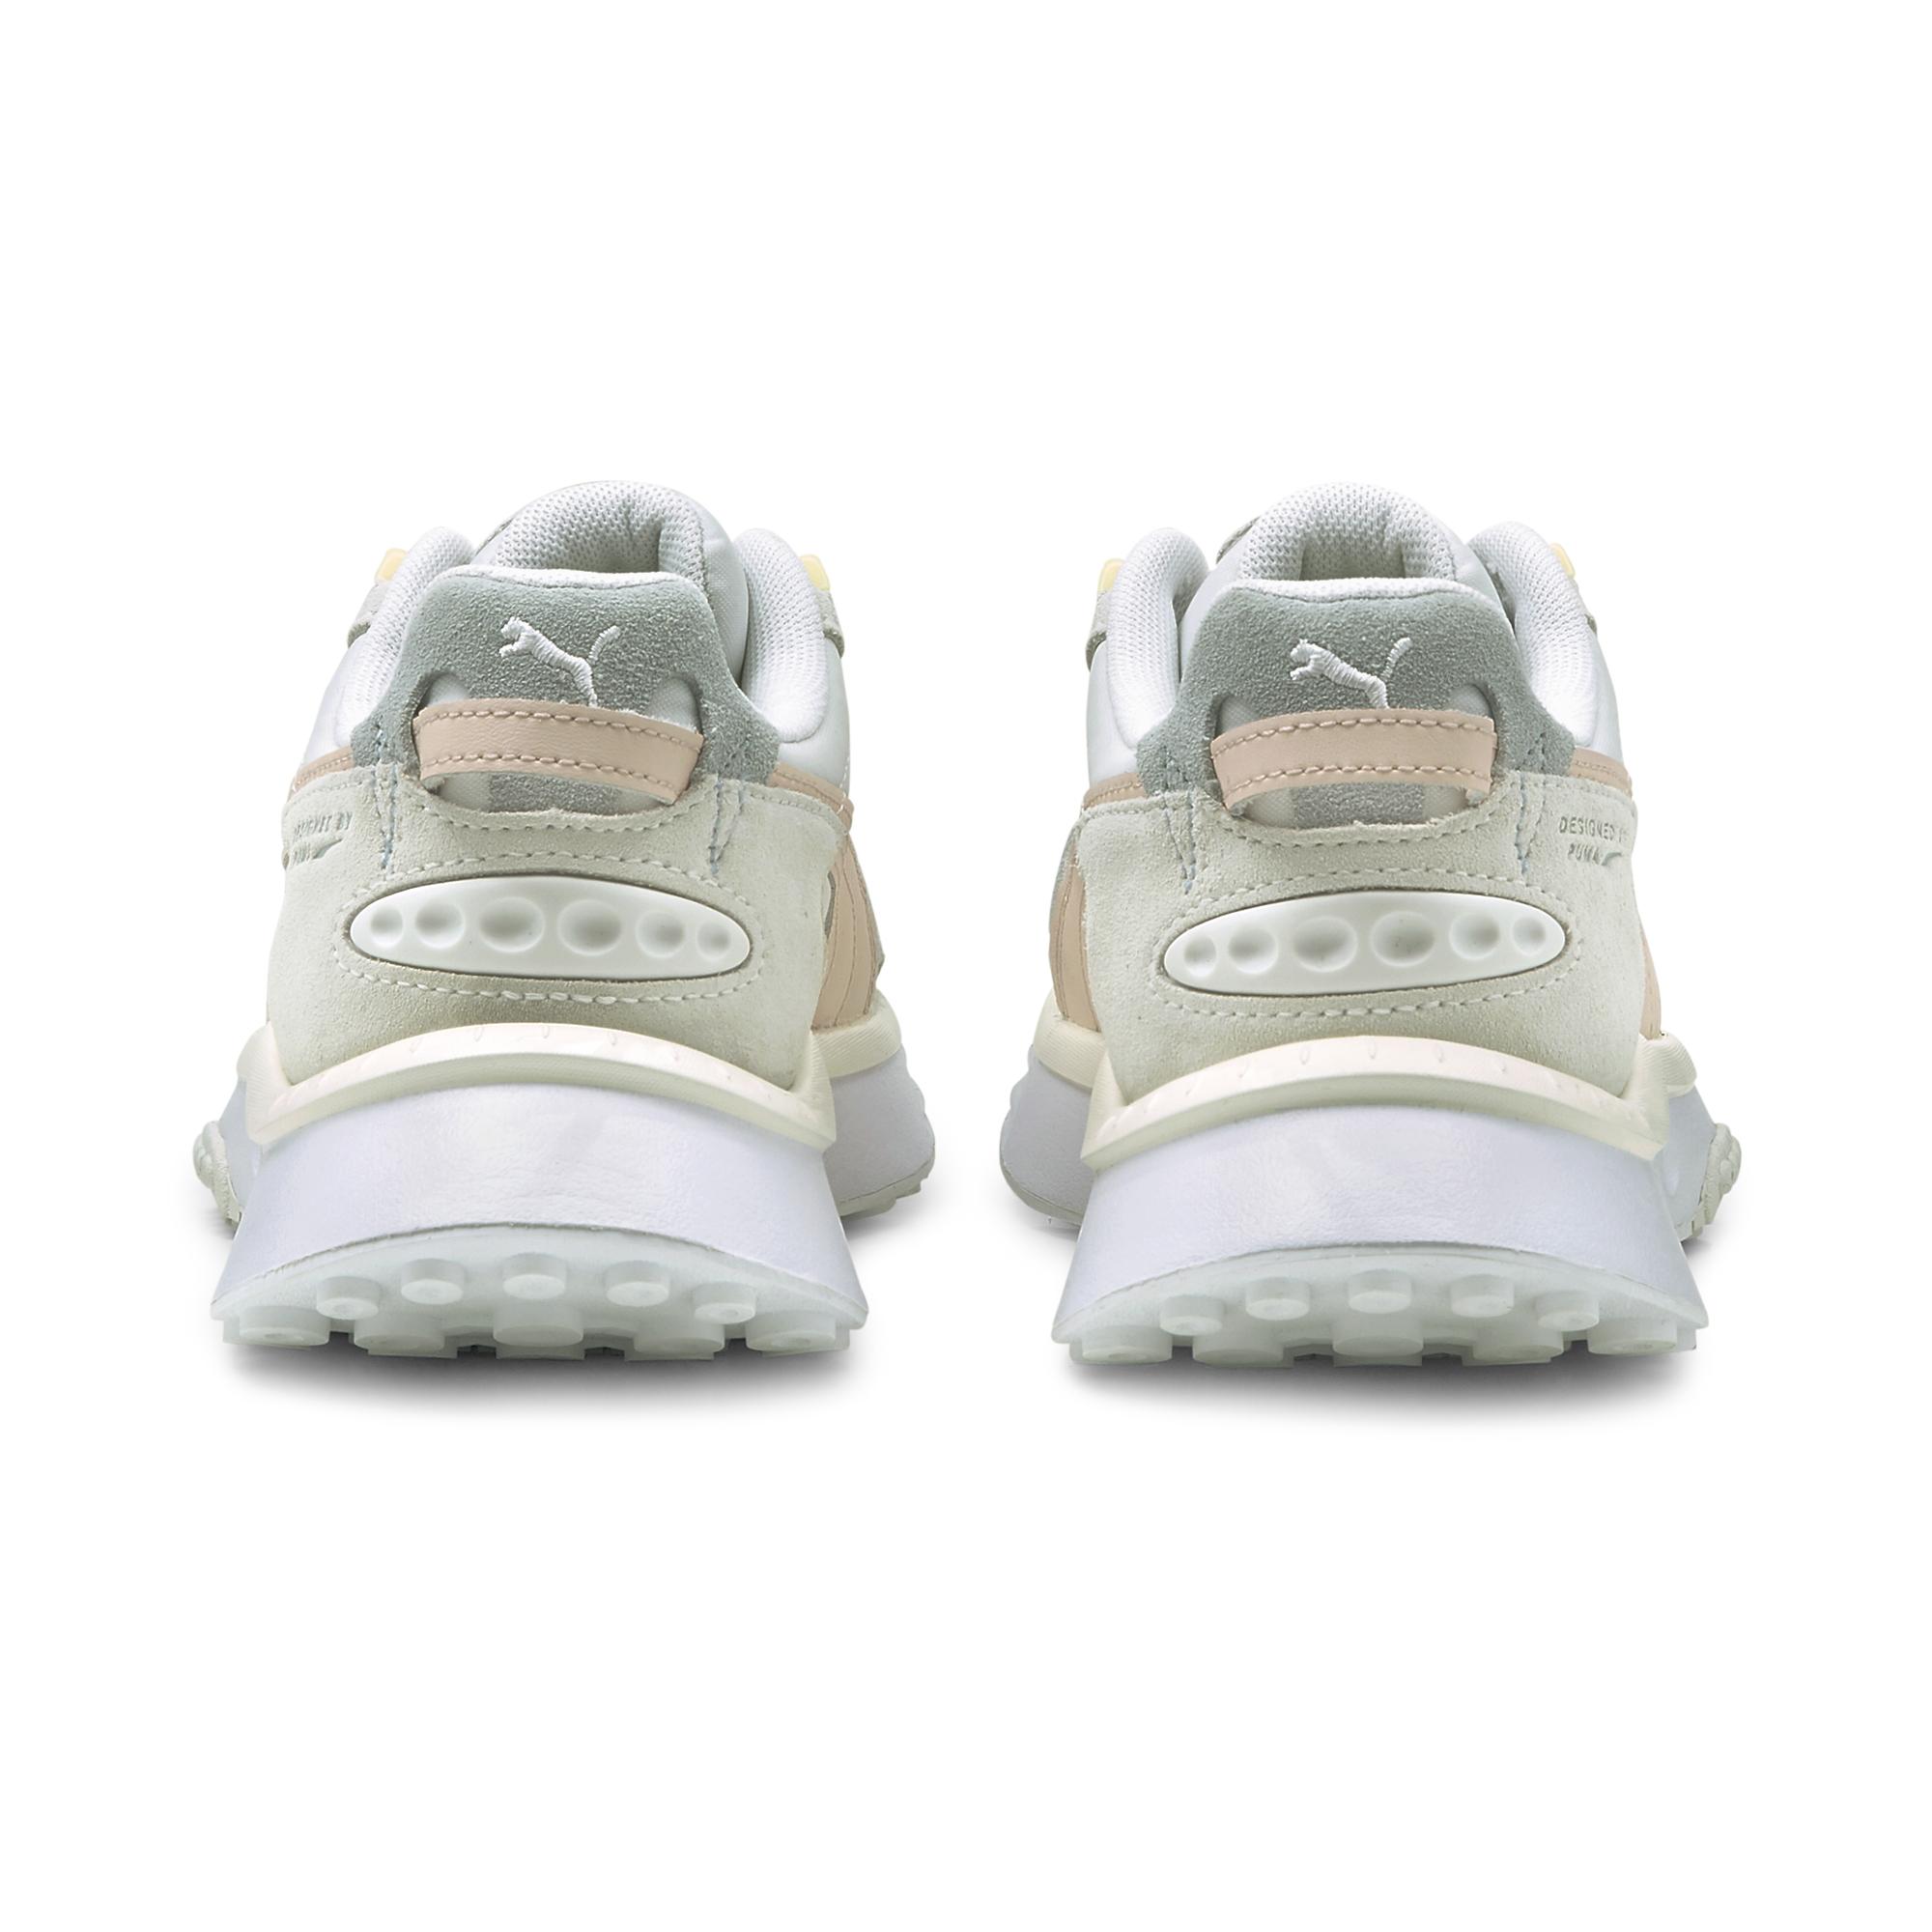 Puma Wild Rider Layers sneakers, blue fog, 37